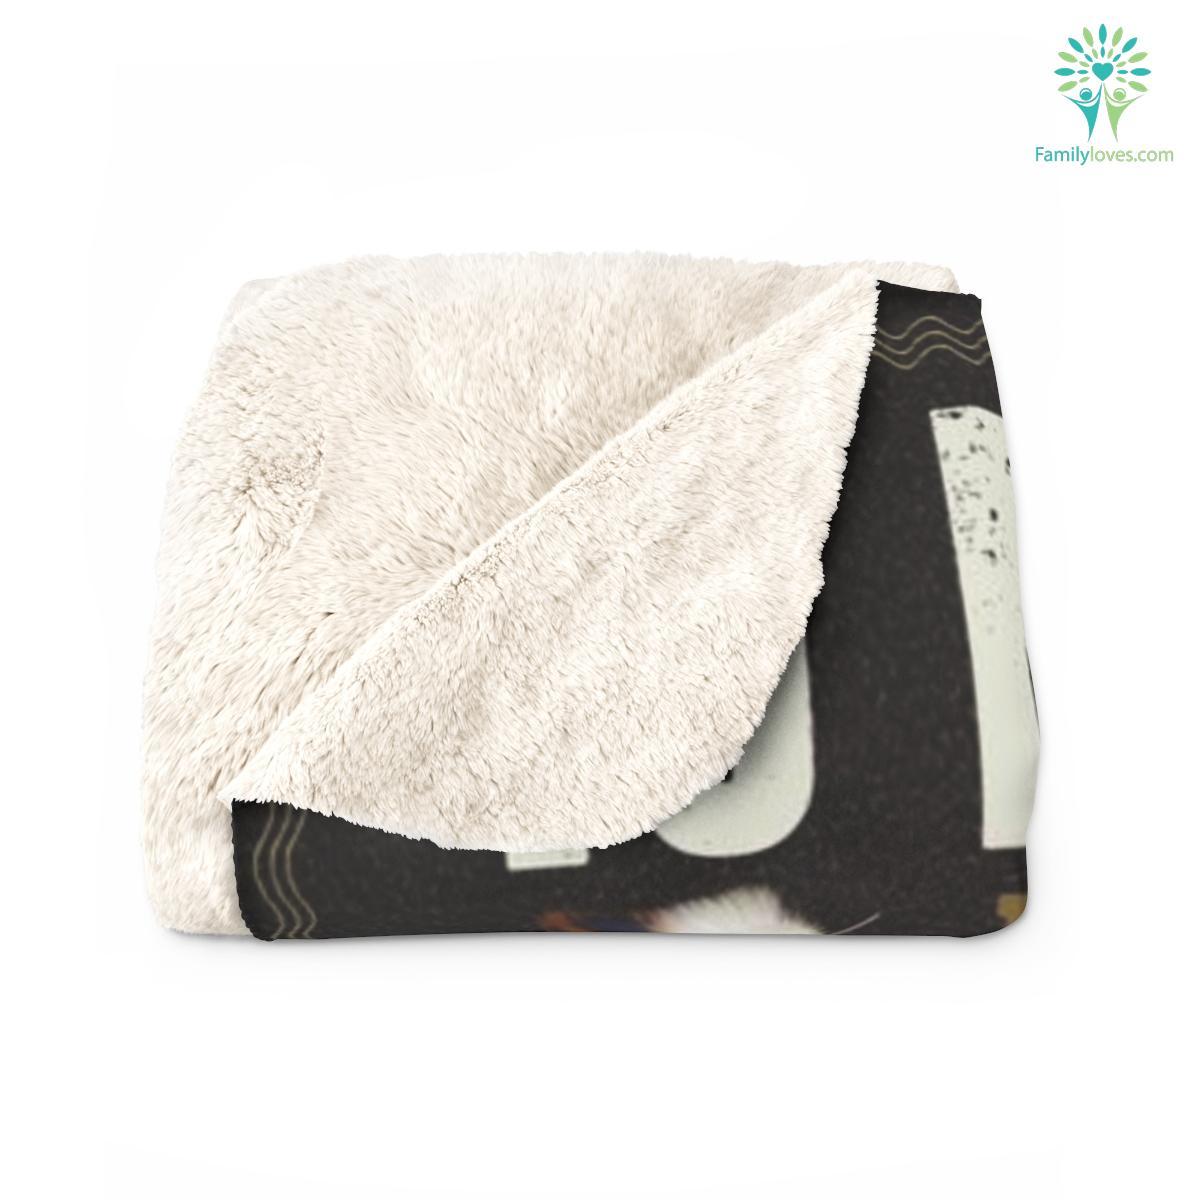 To My Son Sherpa Fleece Blanket Familyloves.com